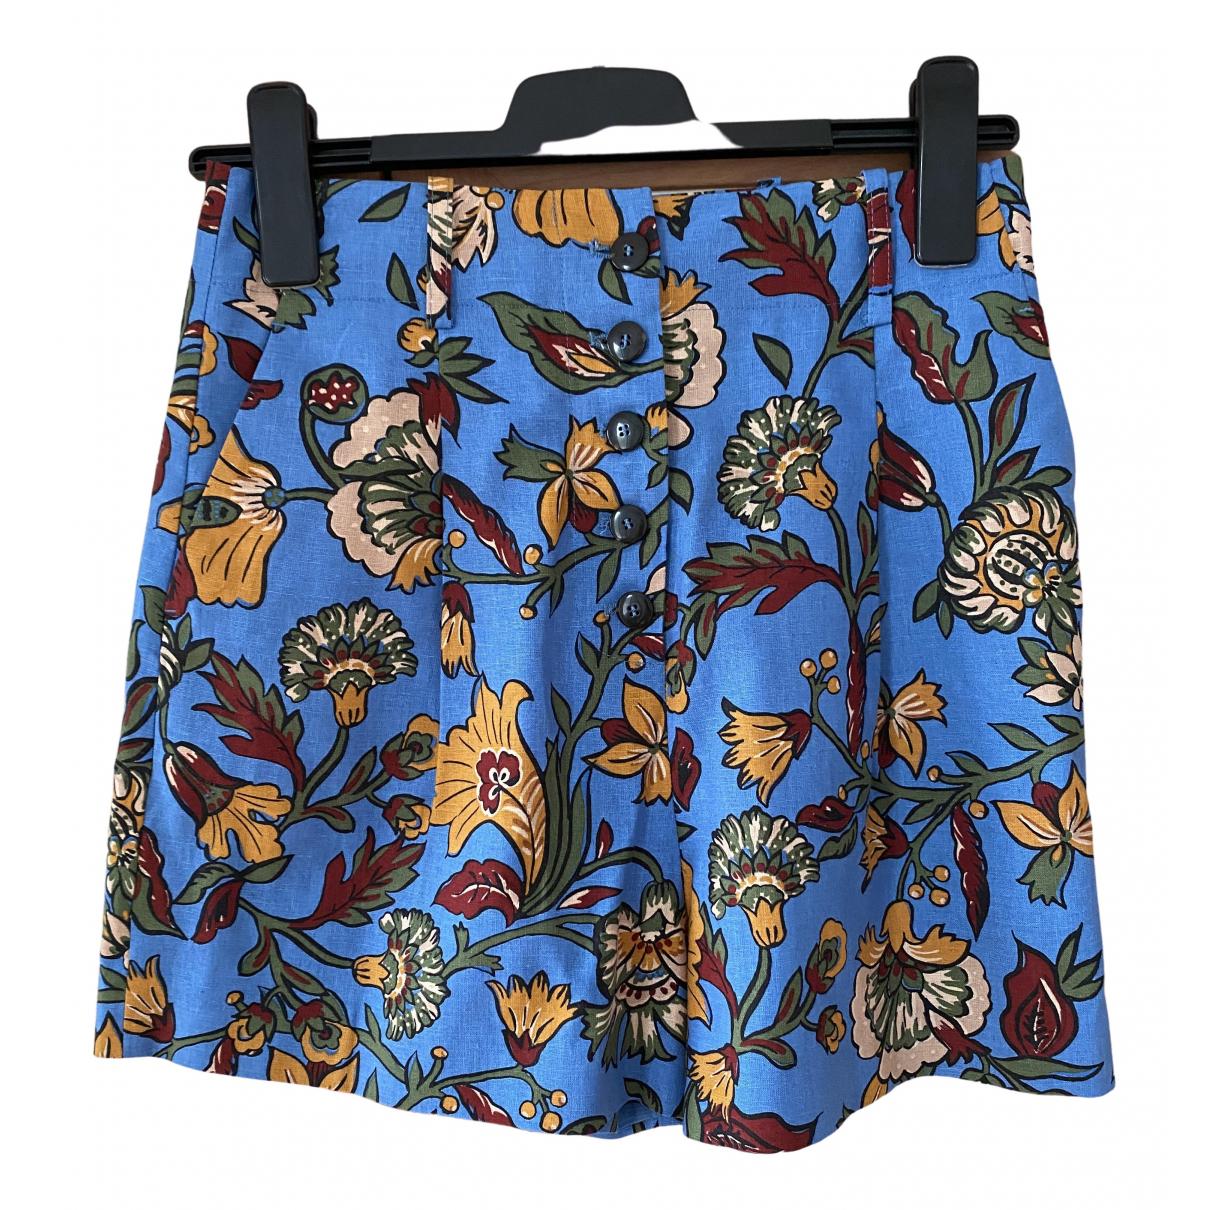 Sezane Spring Summer 2020 Shorts in  Bunt Baumwolle